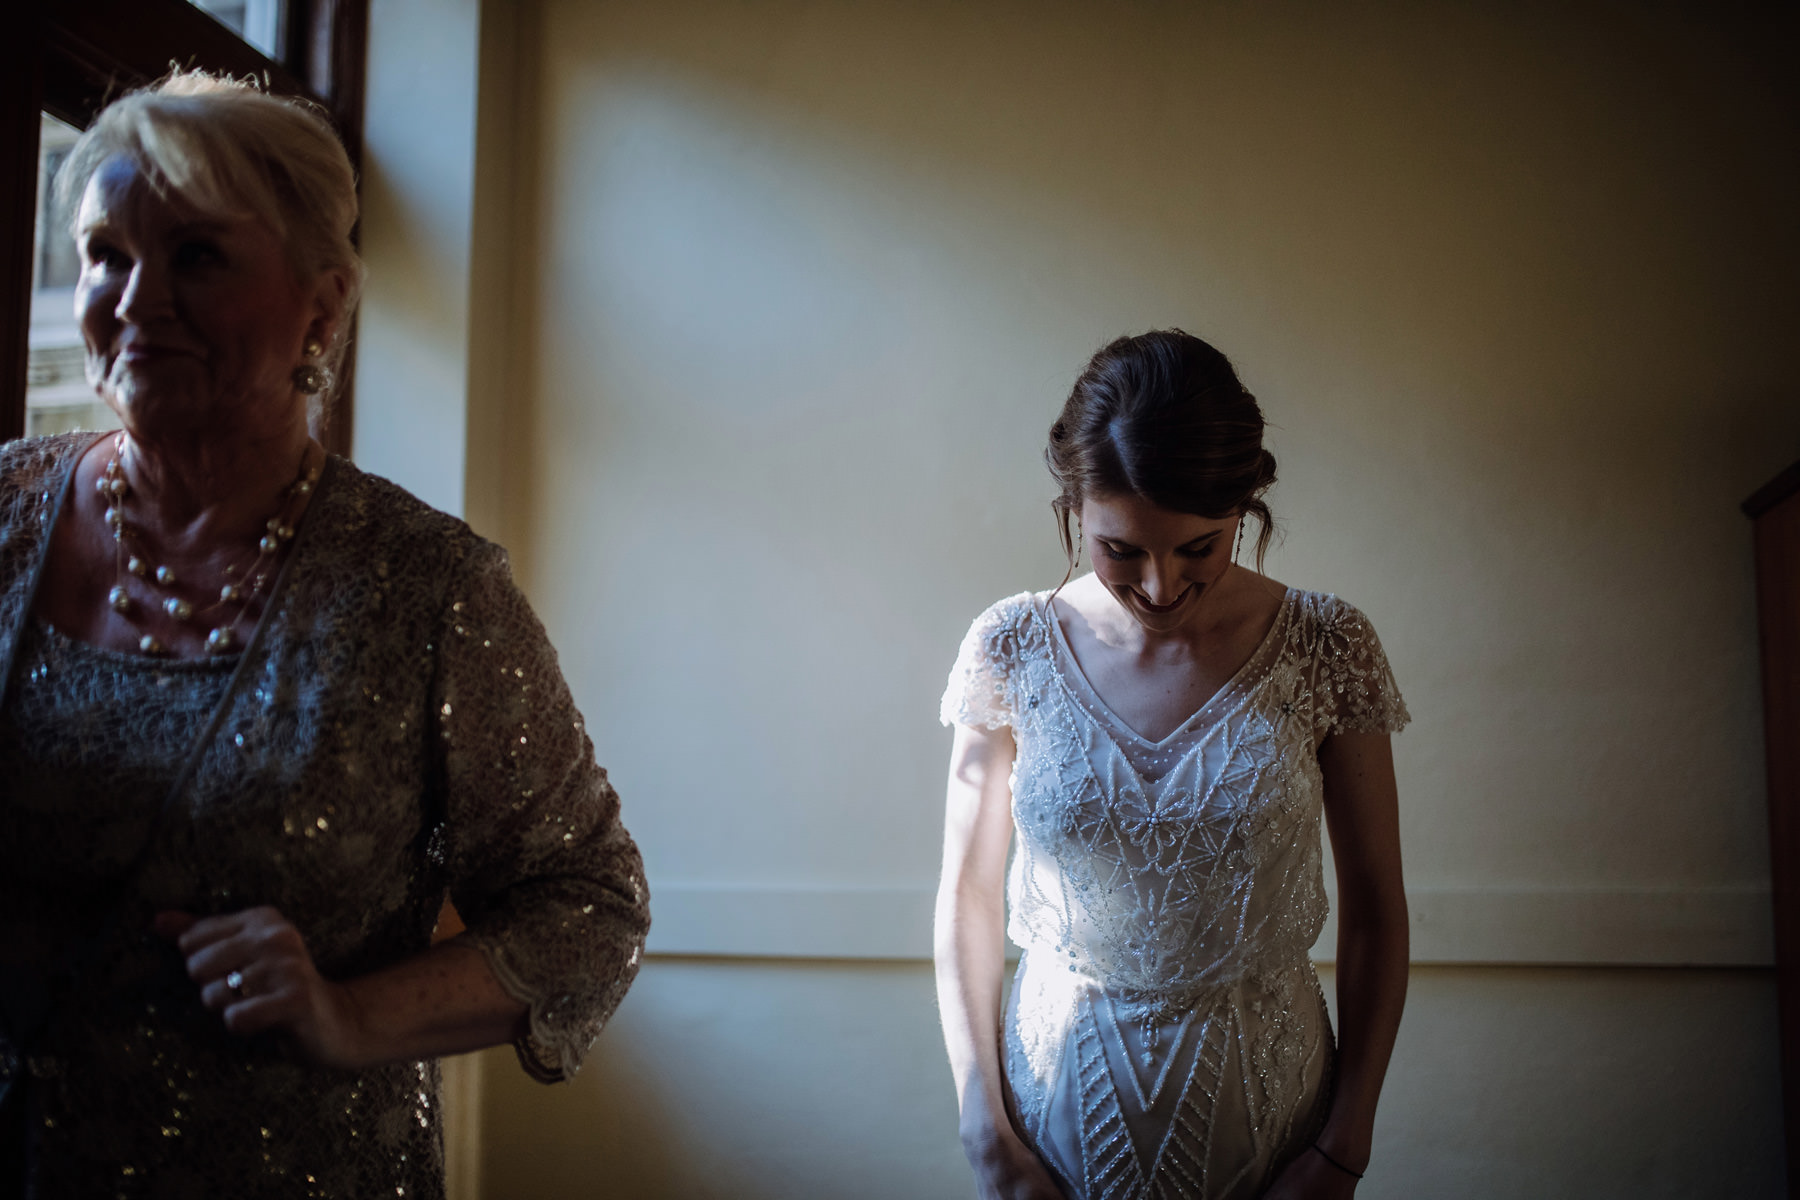 Memorial Presbyterian Wedding in St. Louis Missouri_Kindling Wedding Photography016.JPG